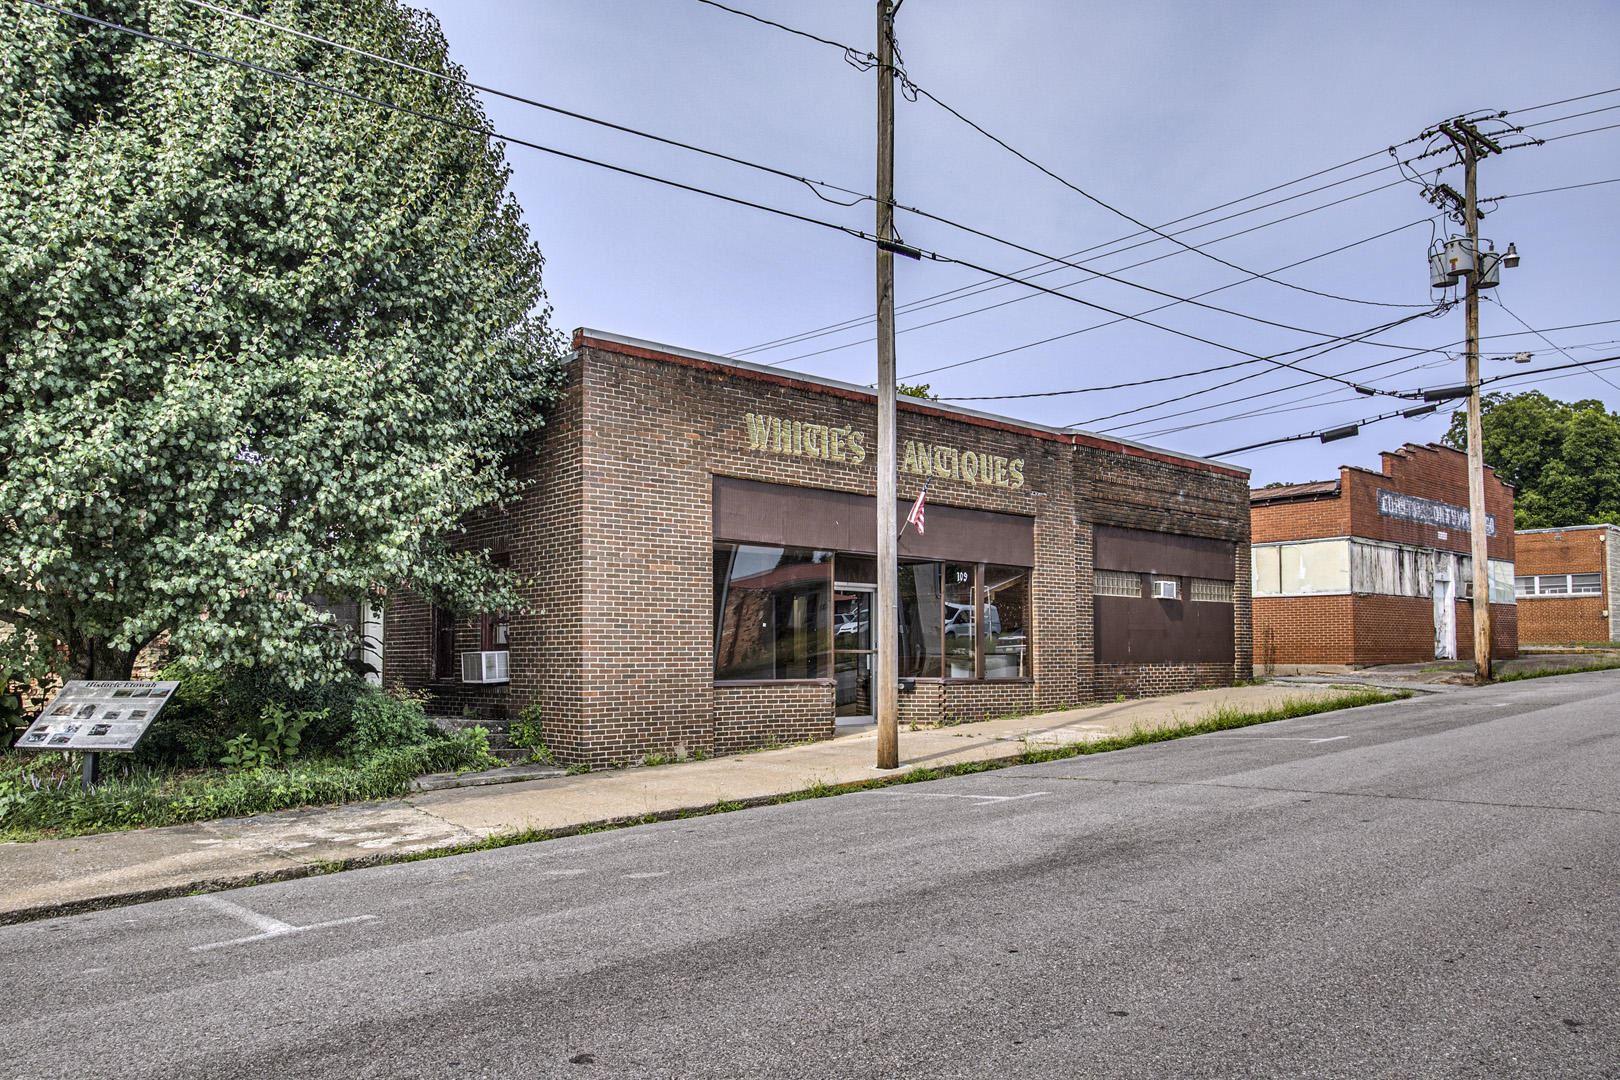 Photo of 109 9th Street St, Etowah, TN 37331 (MLS # 1163701)